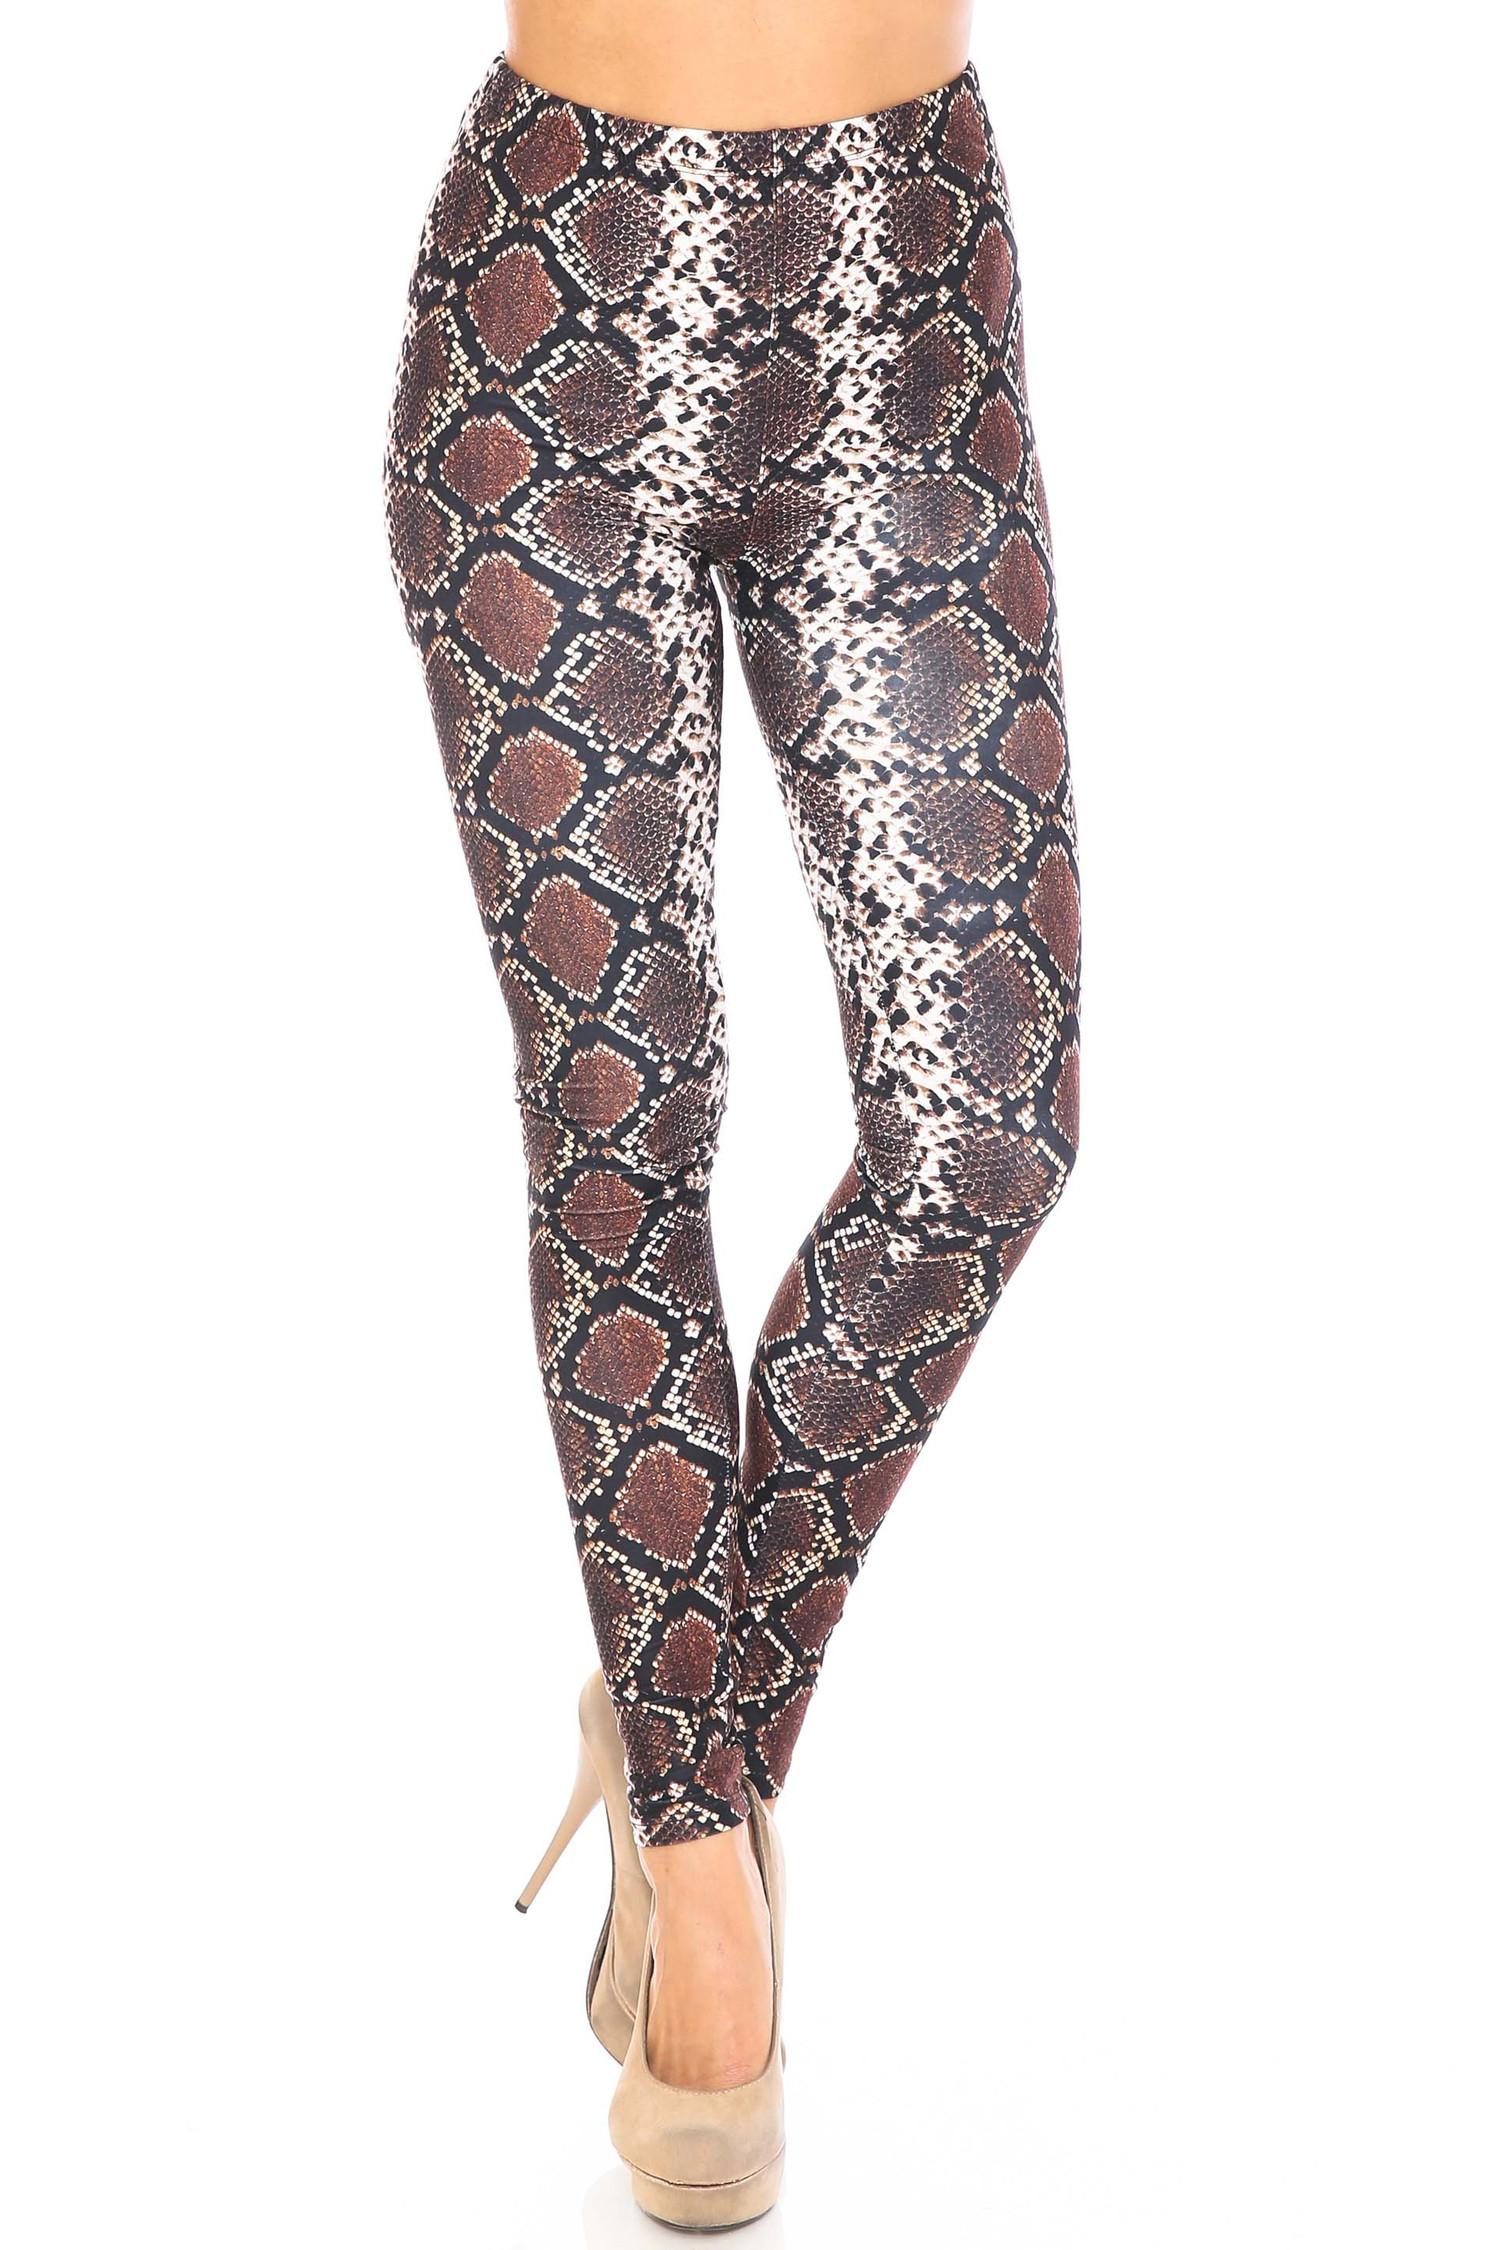 Front side image of Creamy Soft  Brown Boa Snake Leggings - USA Fashion™